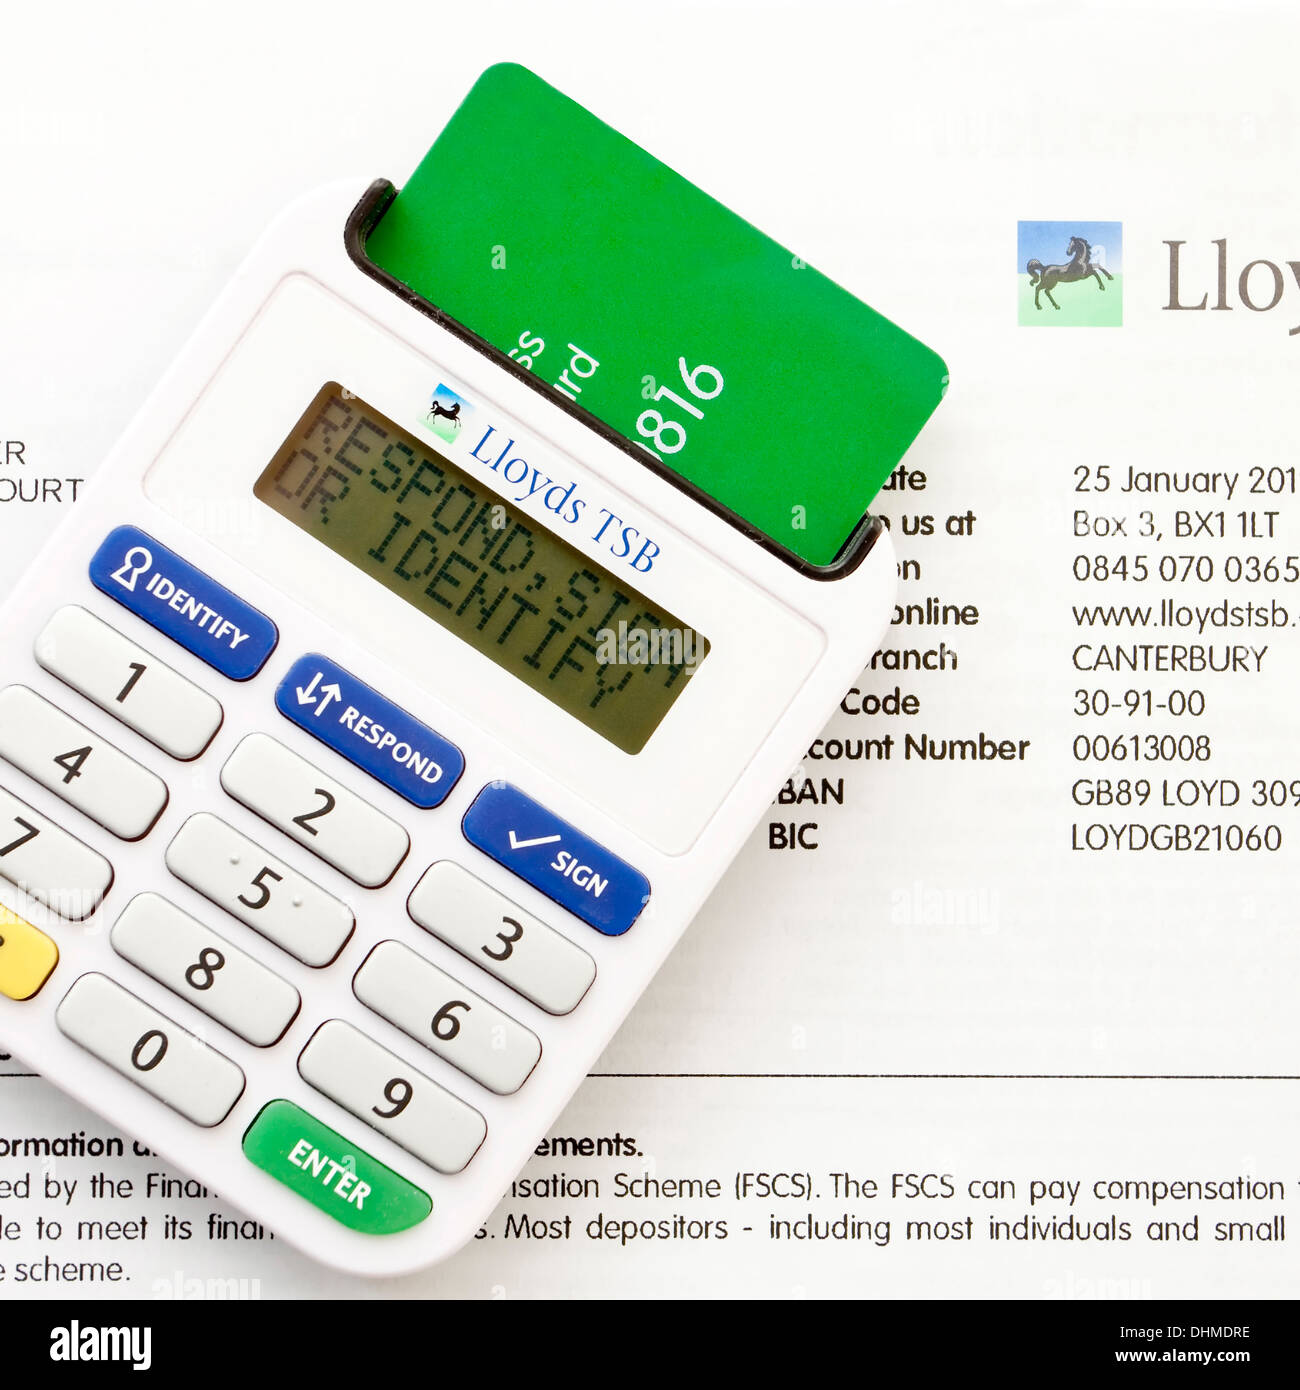 Lloyds tsb bank security card reader and bank statement stock photo lloyds tsb bank security card reader and bank statement reheart Images